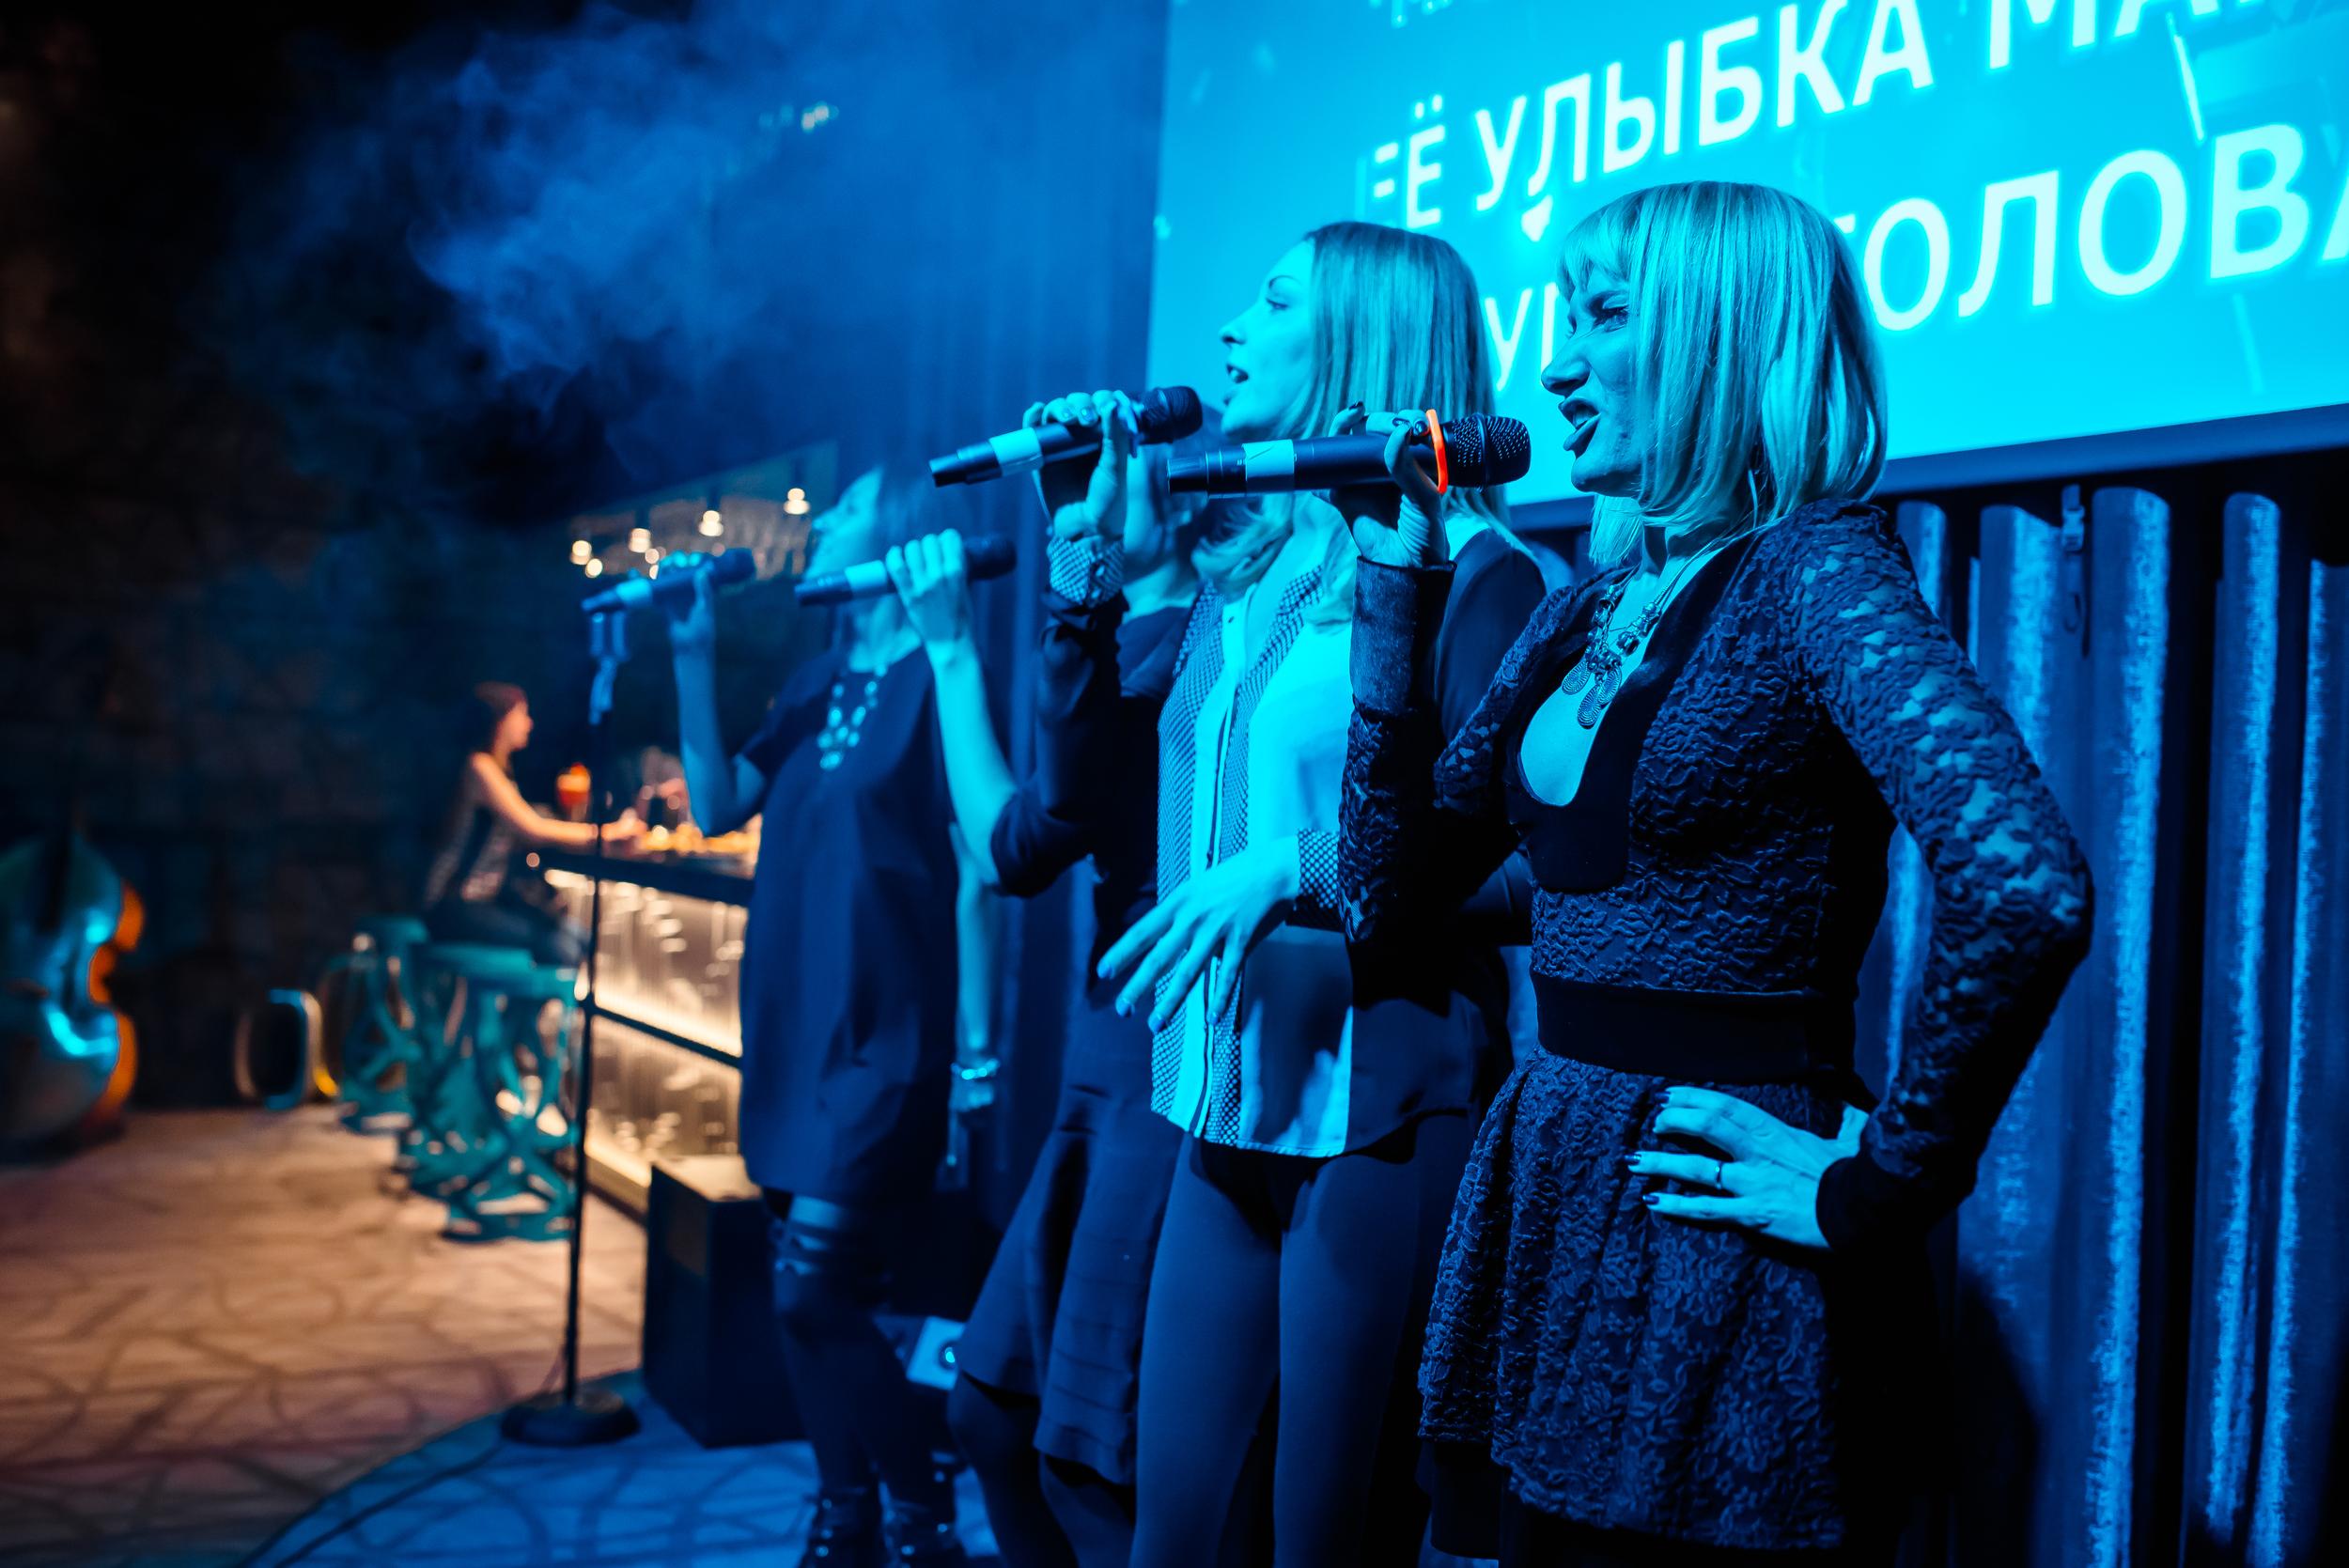 085_2015-02-26_22-19-16_Kiseleva.jpg